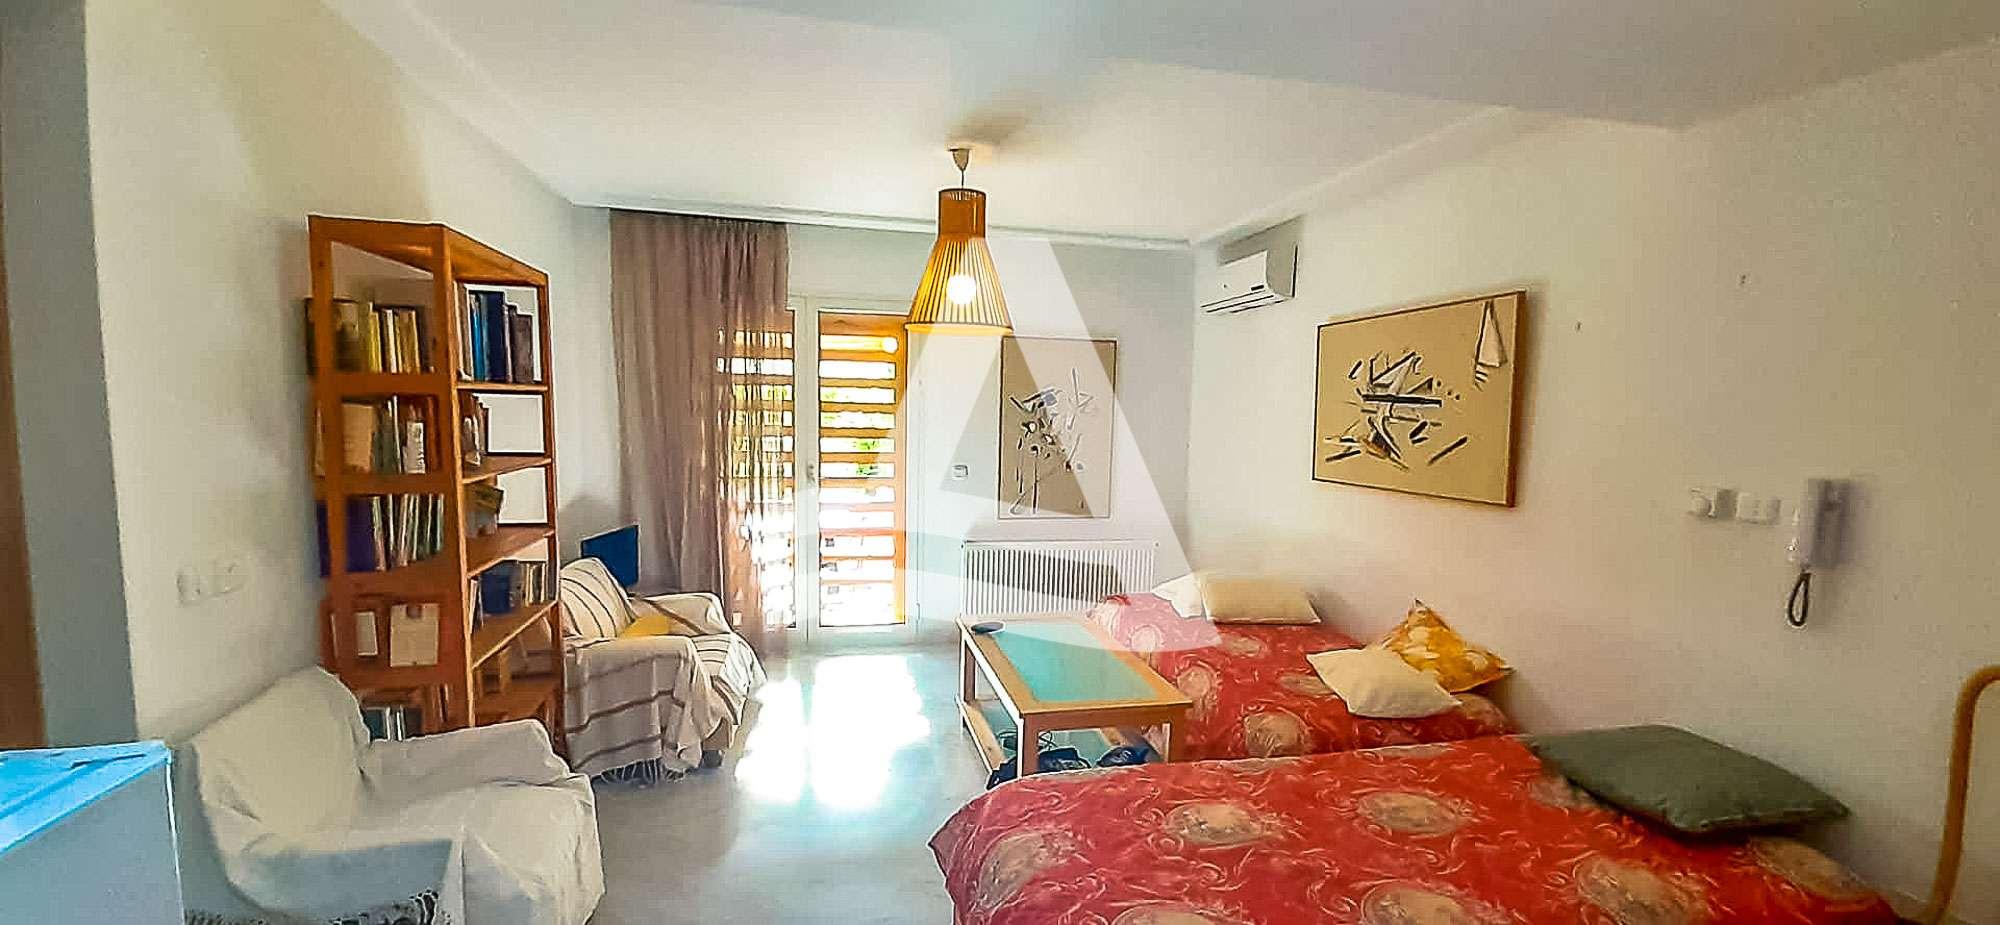 httpss3.amazonaws.comlogimoaws_Arcane_immobilière_la_Marsa-_location_-_vente_la_marsa_9_sur_12_1574441790507